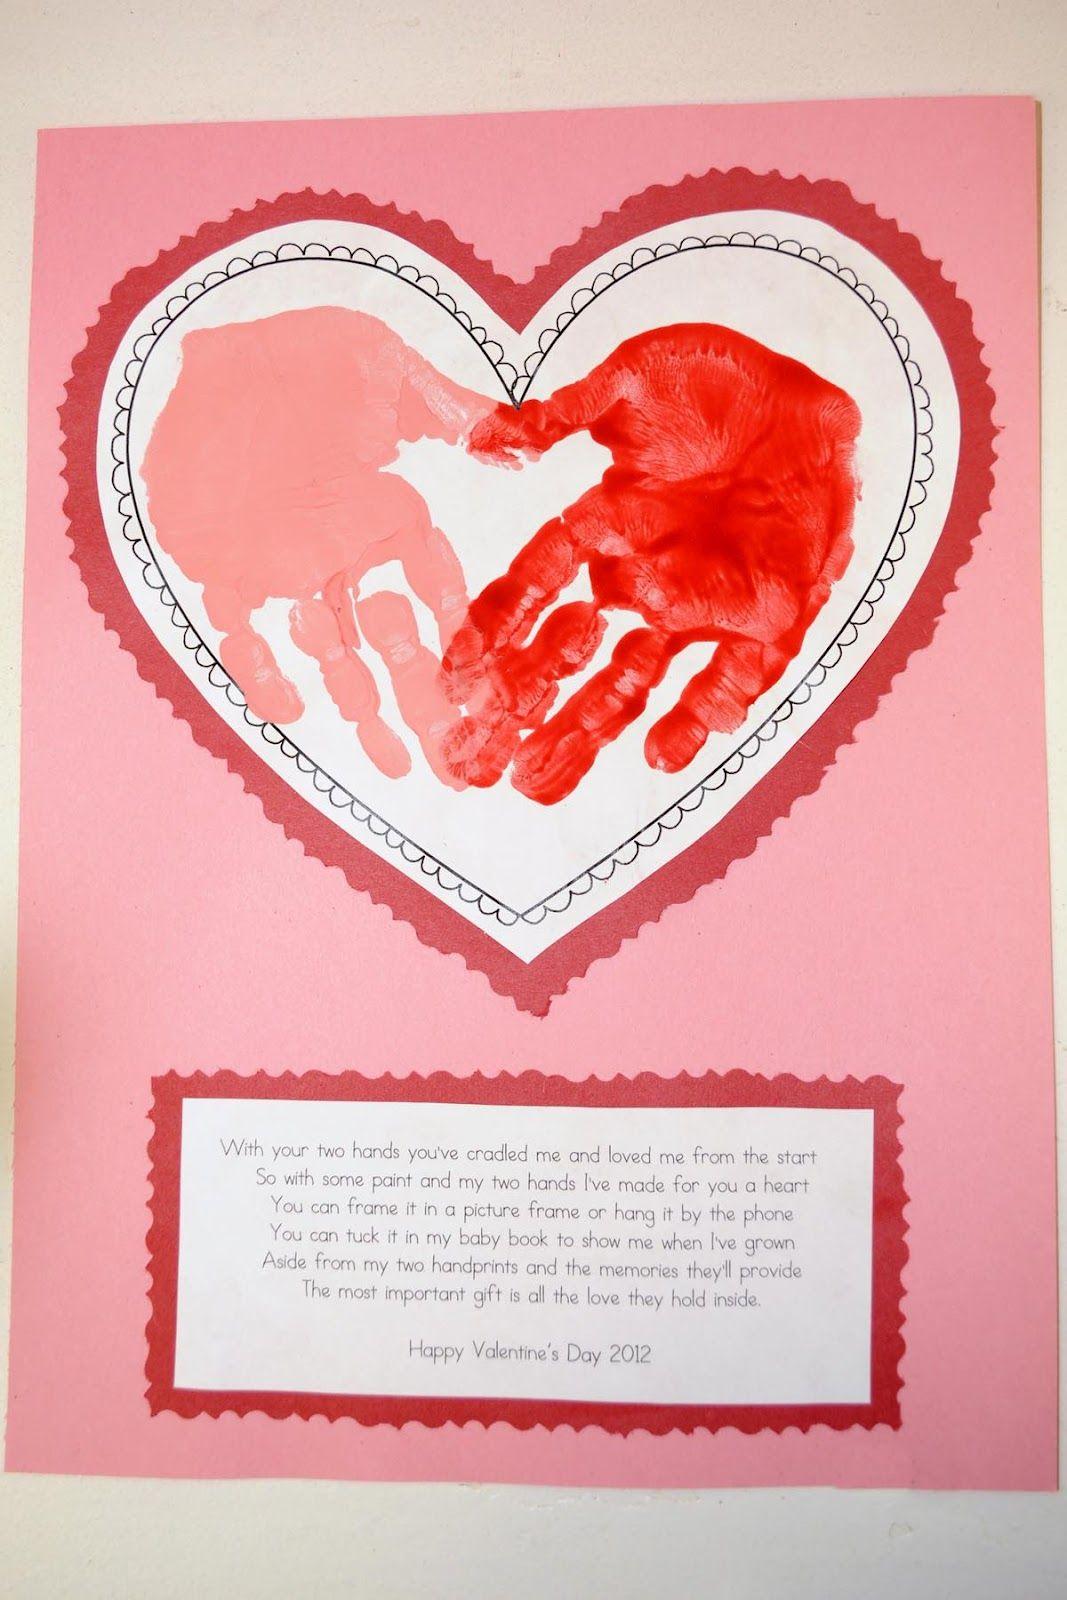 Valentine crafts for kindergarteners -  Angela Miller Cute For Grandparents When They Come Kindergarten Craft